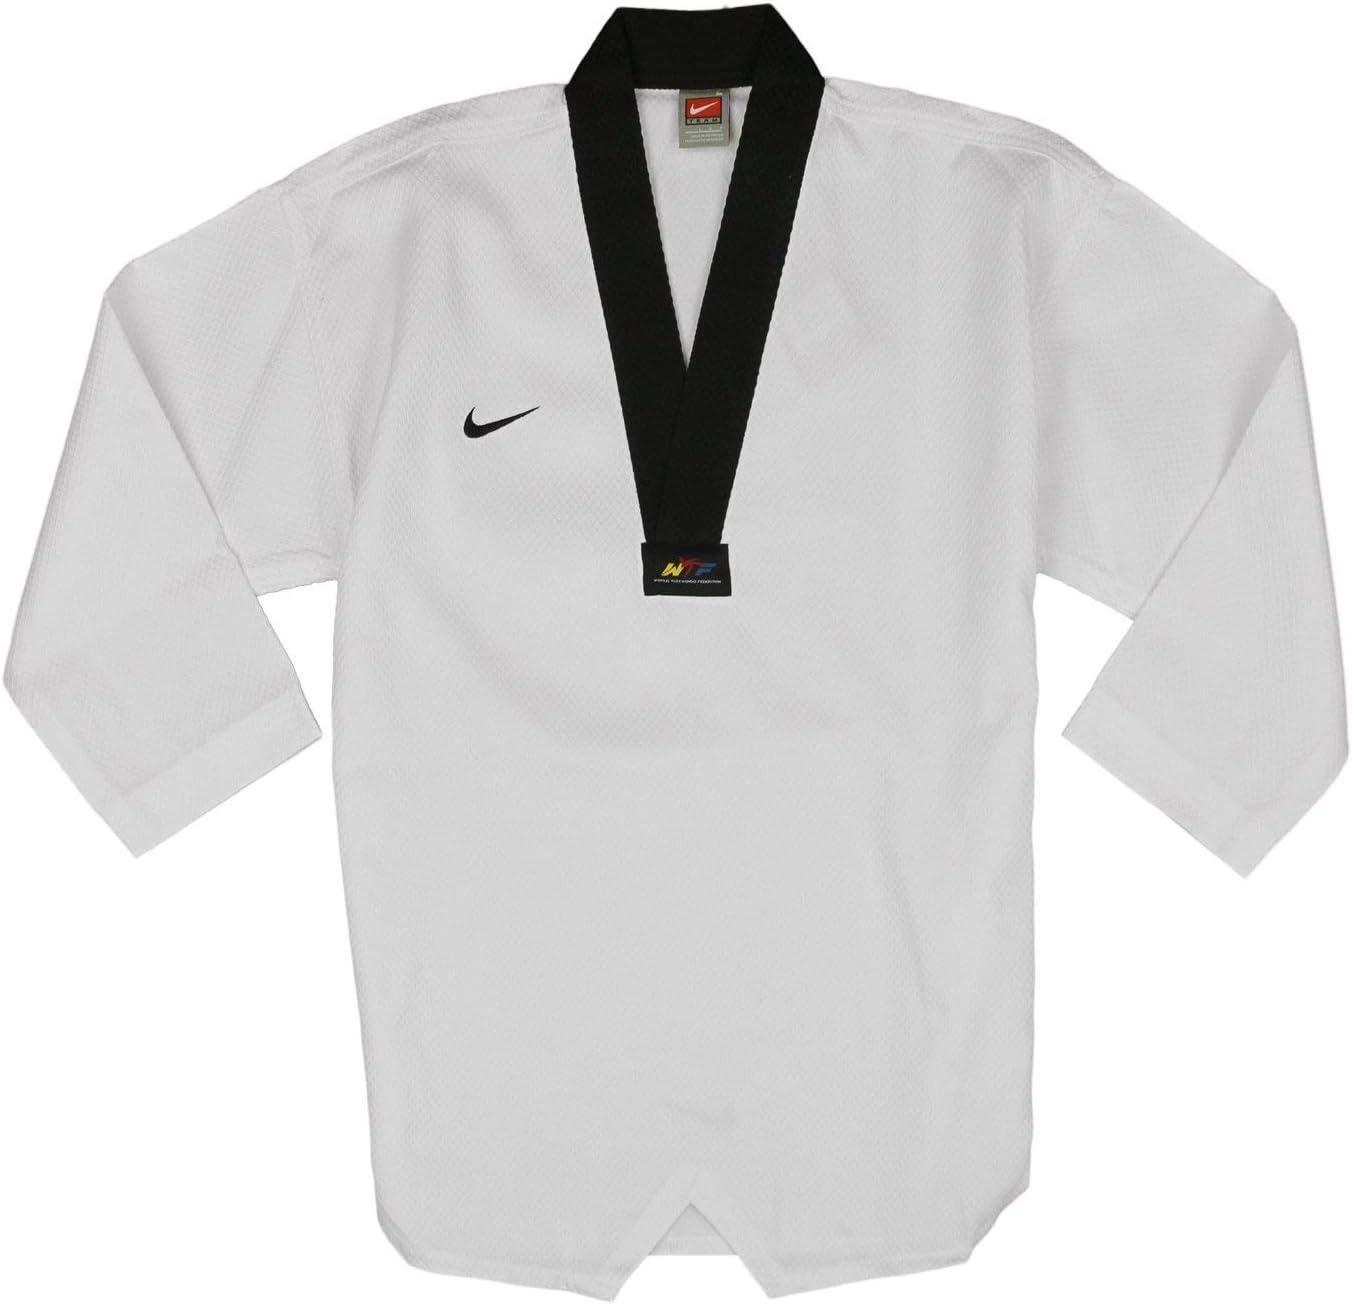 por qué mezcla combustible  Amazon.com : Nike Mens Taekwondo Elite Uniform : Clothing